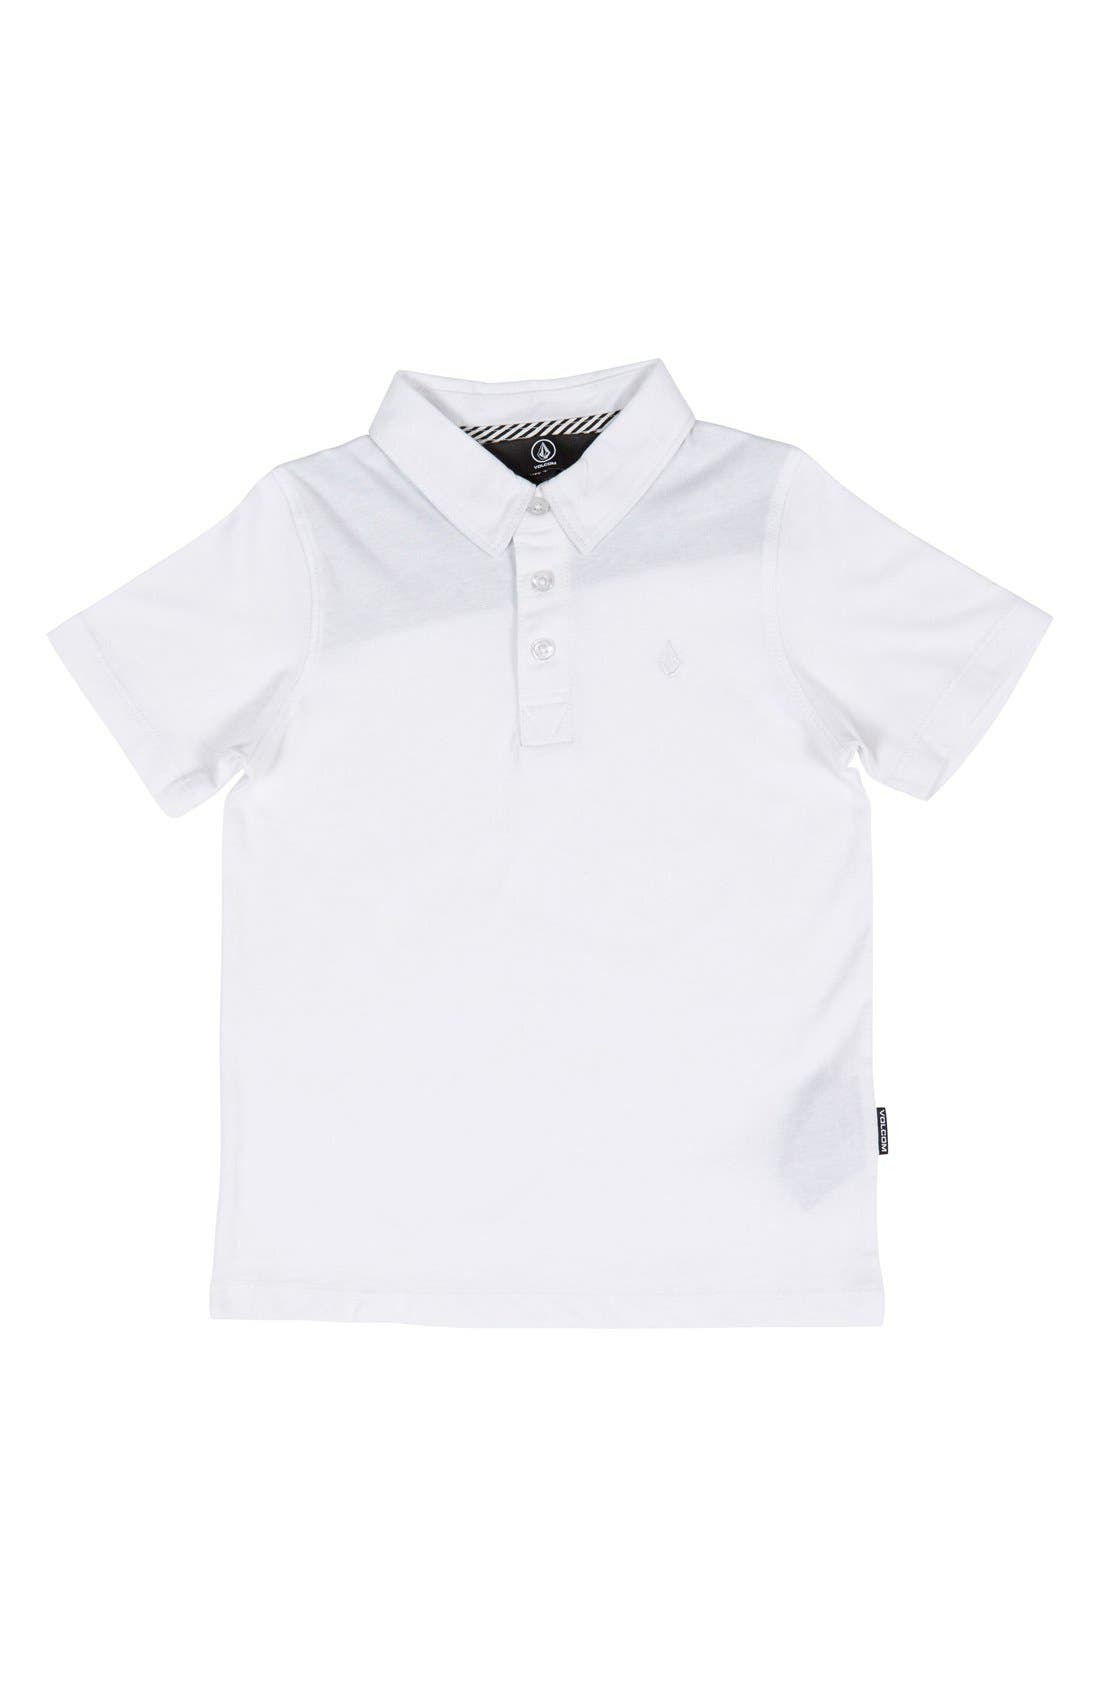 Wowzer Polo,                         Main,                         color, WHITE